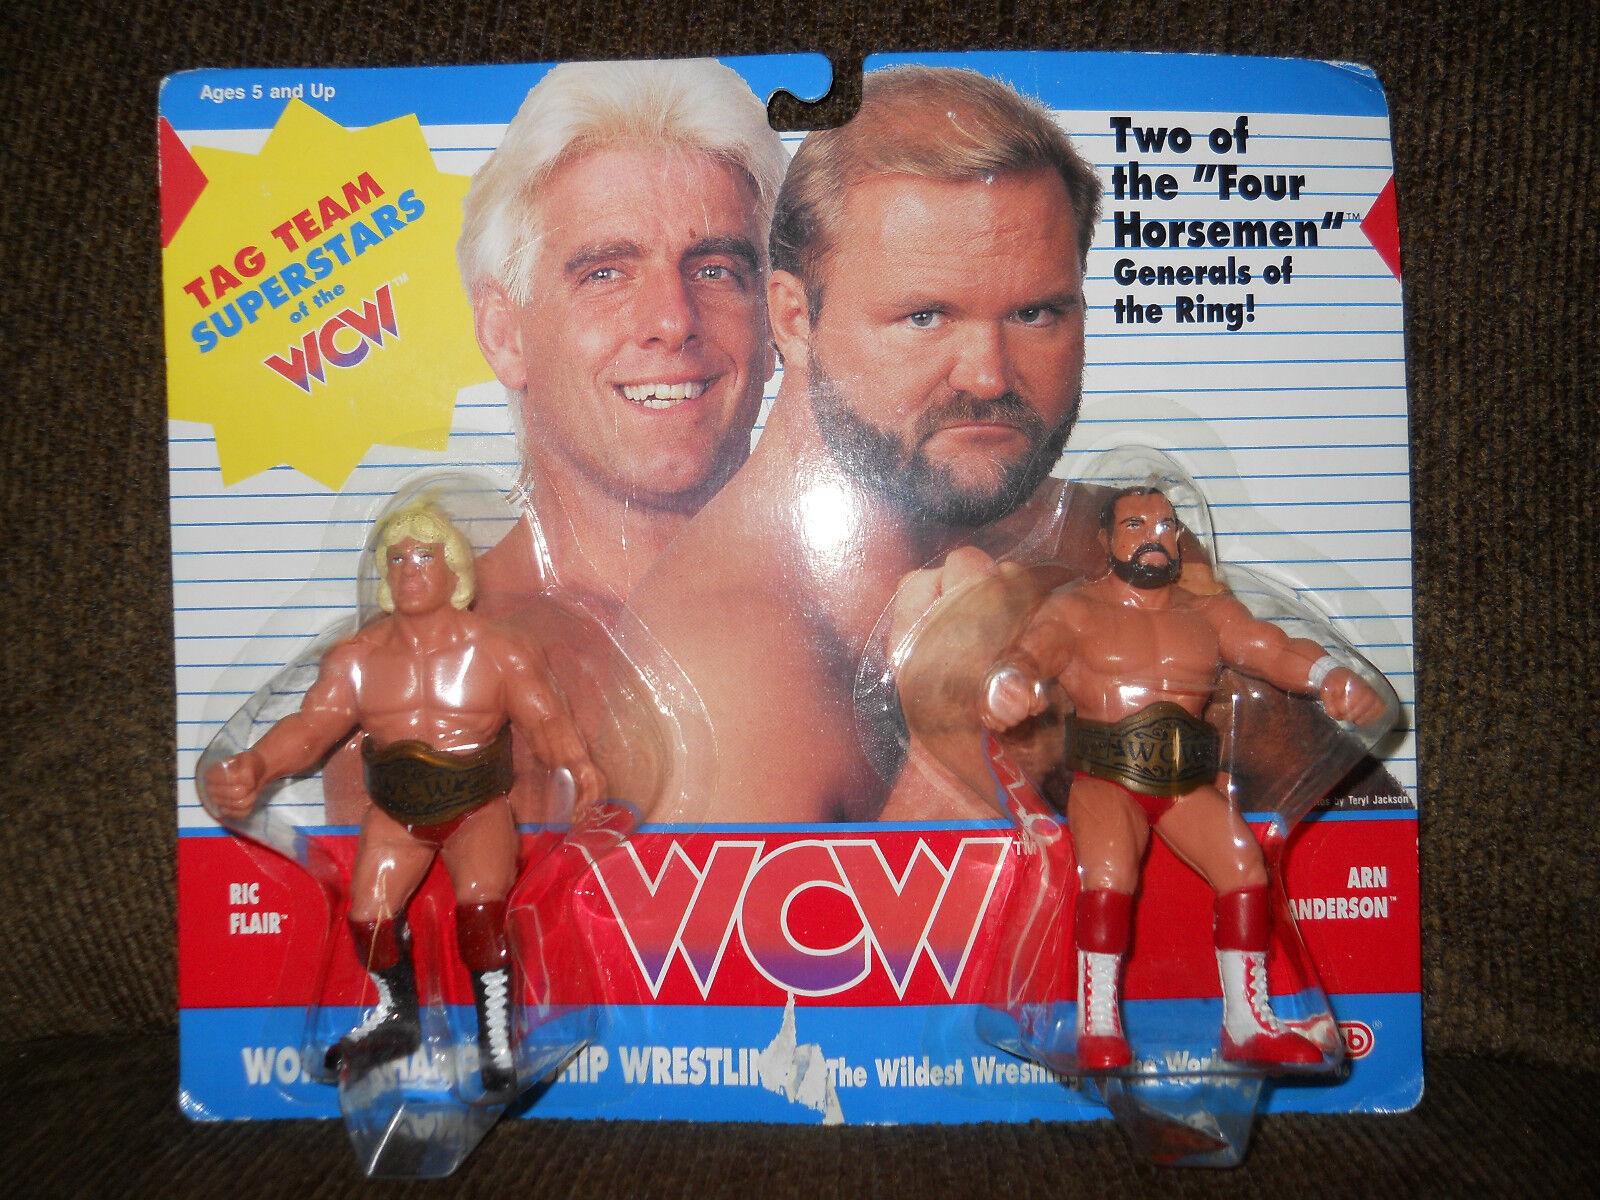 GALOOB WCW wwf awa RIC FLAIR ARN ANDERSON UK editn hornby,moc 4 four horsemen